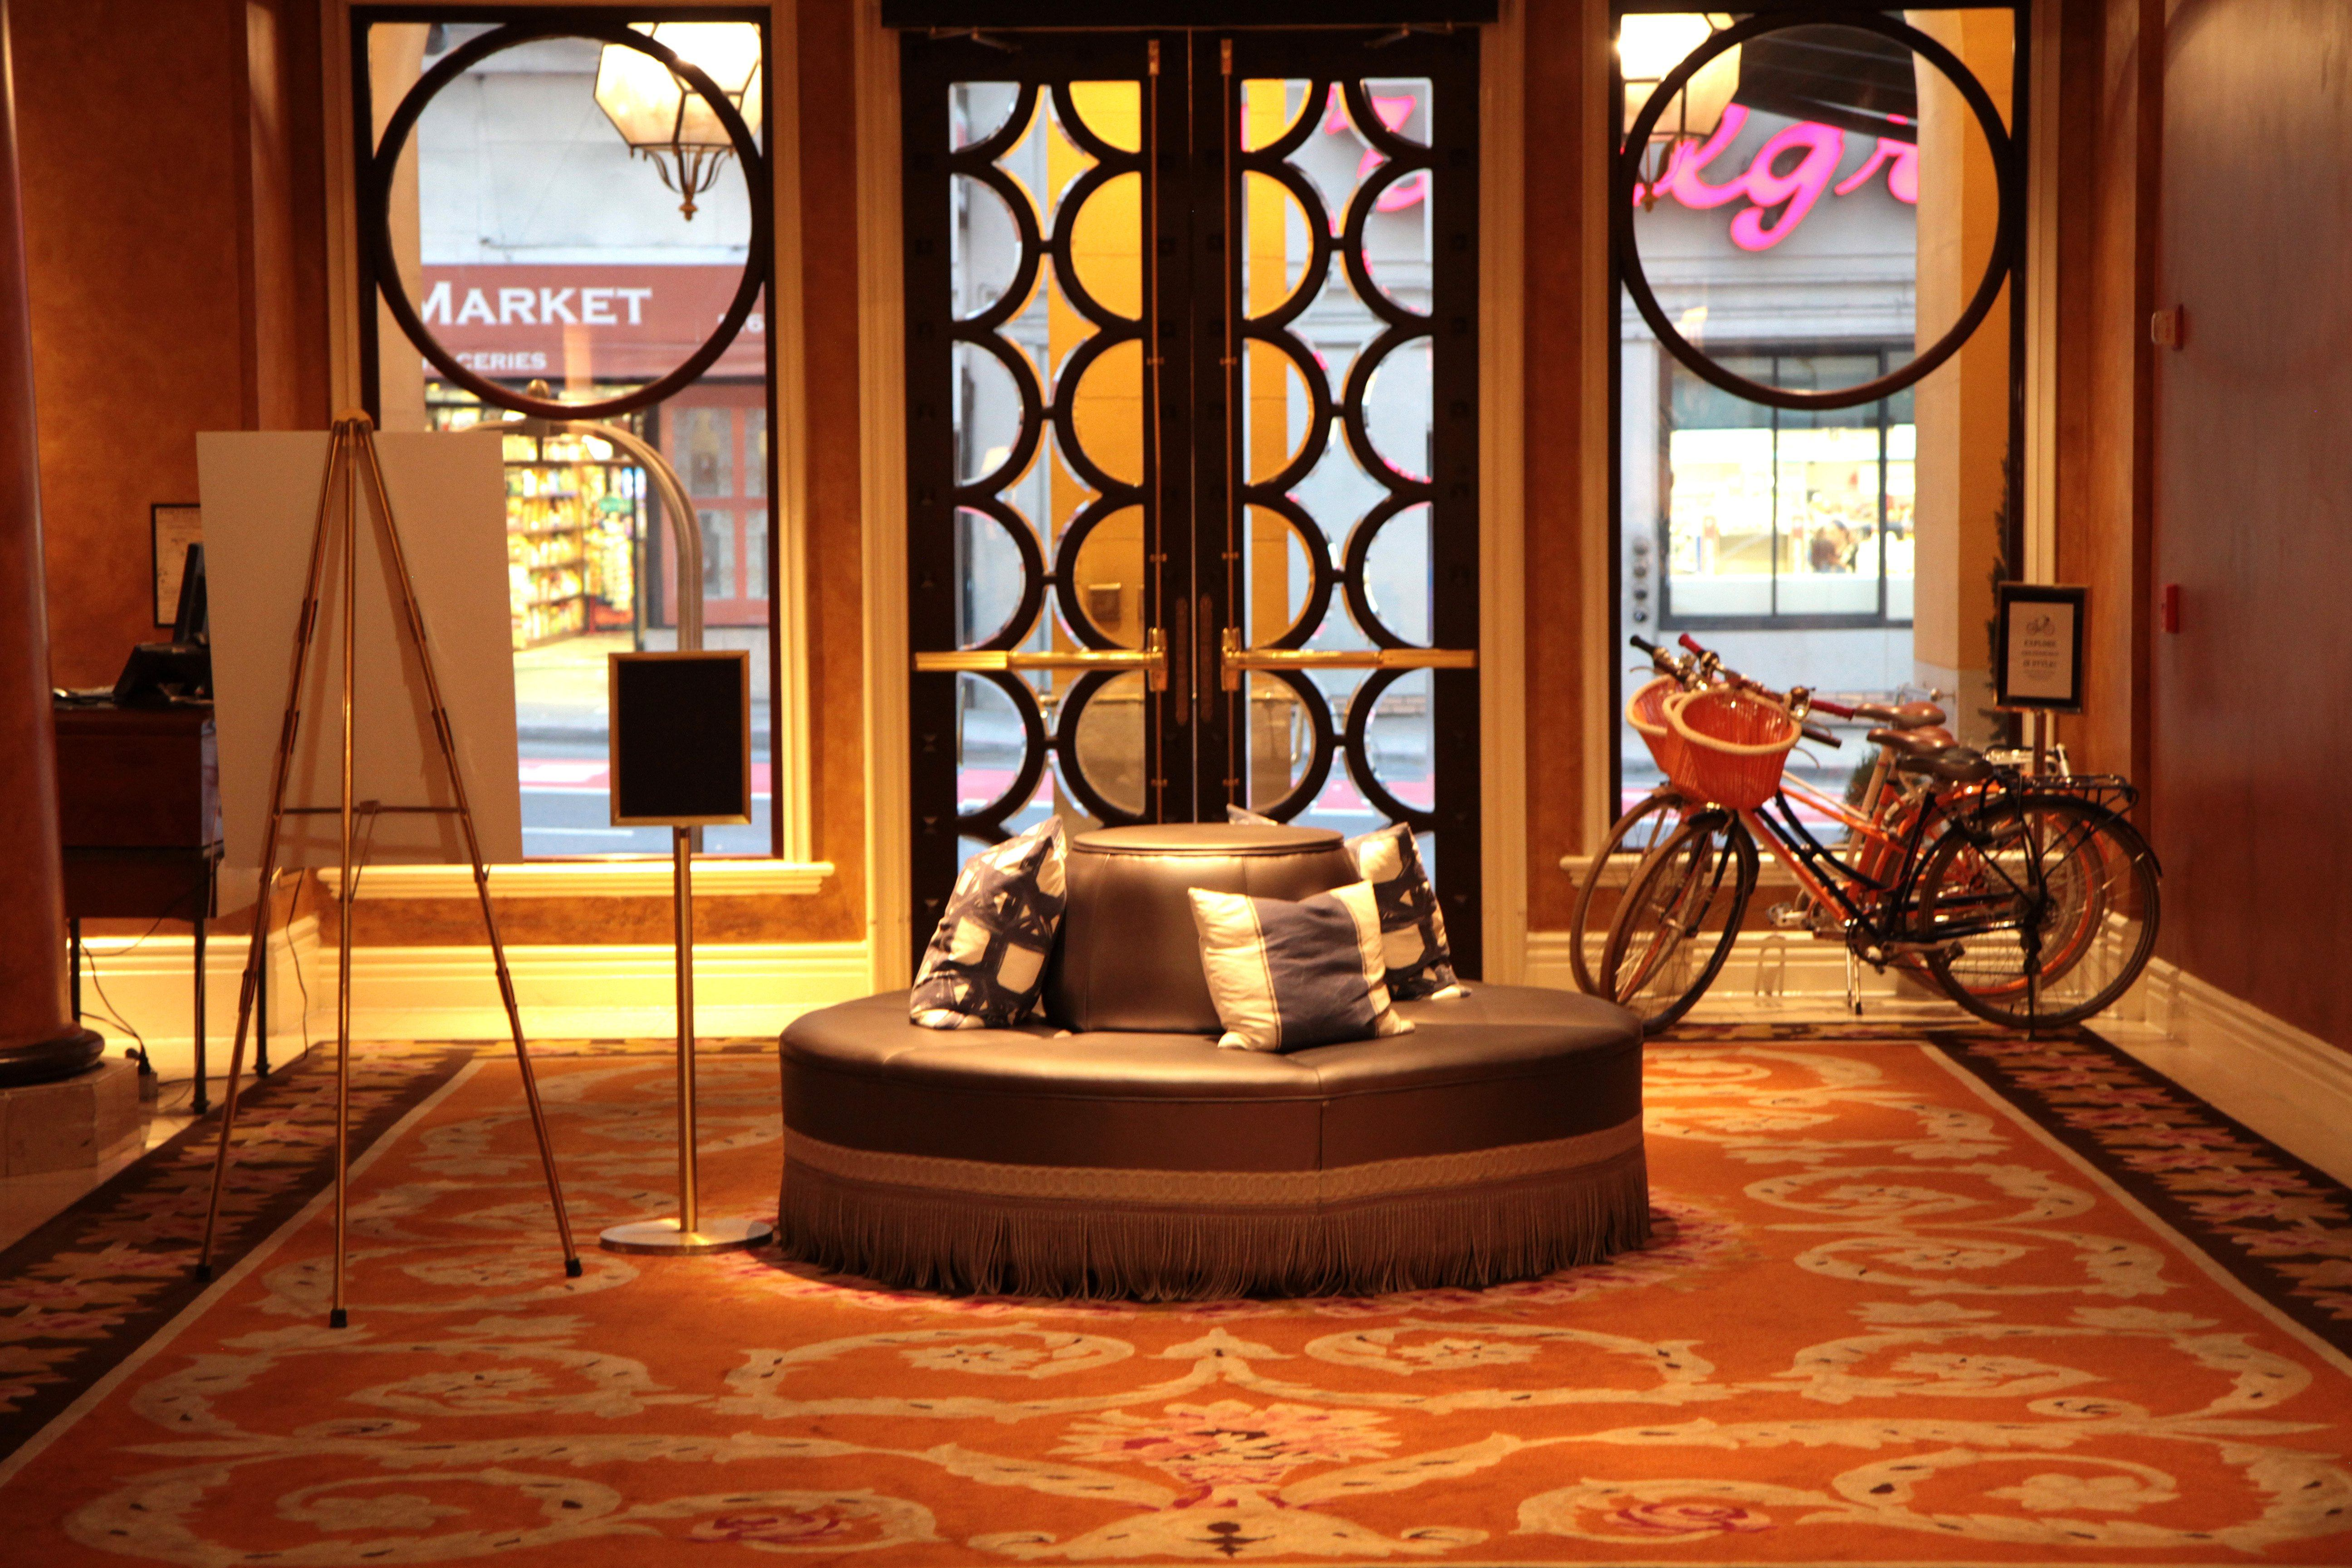 Hotel lobby at The Marker